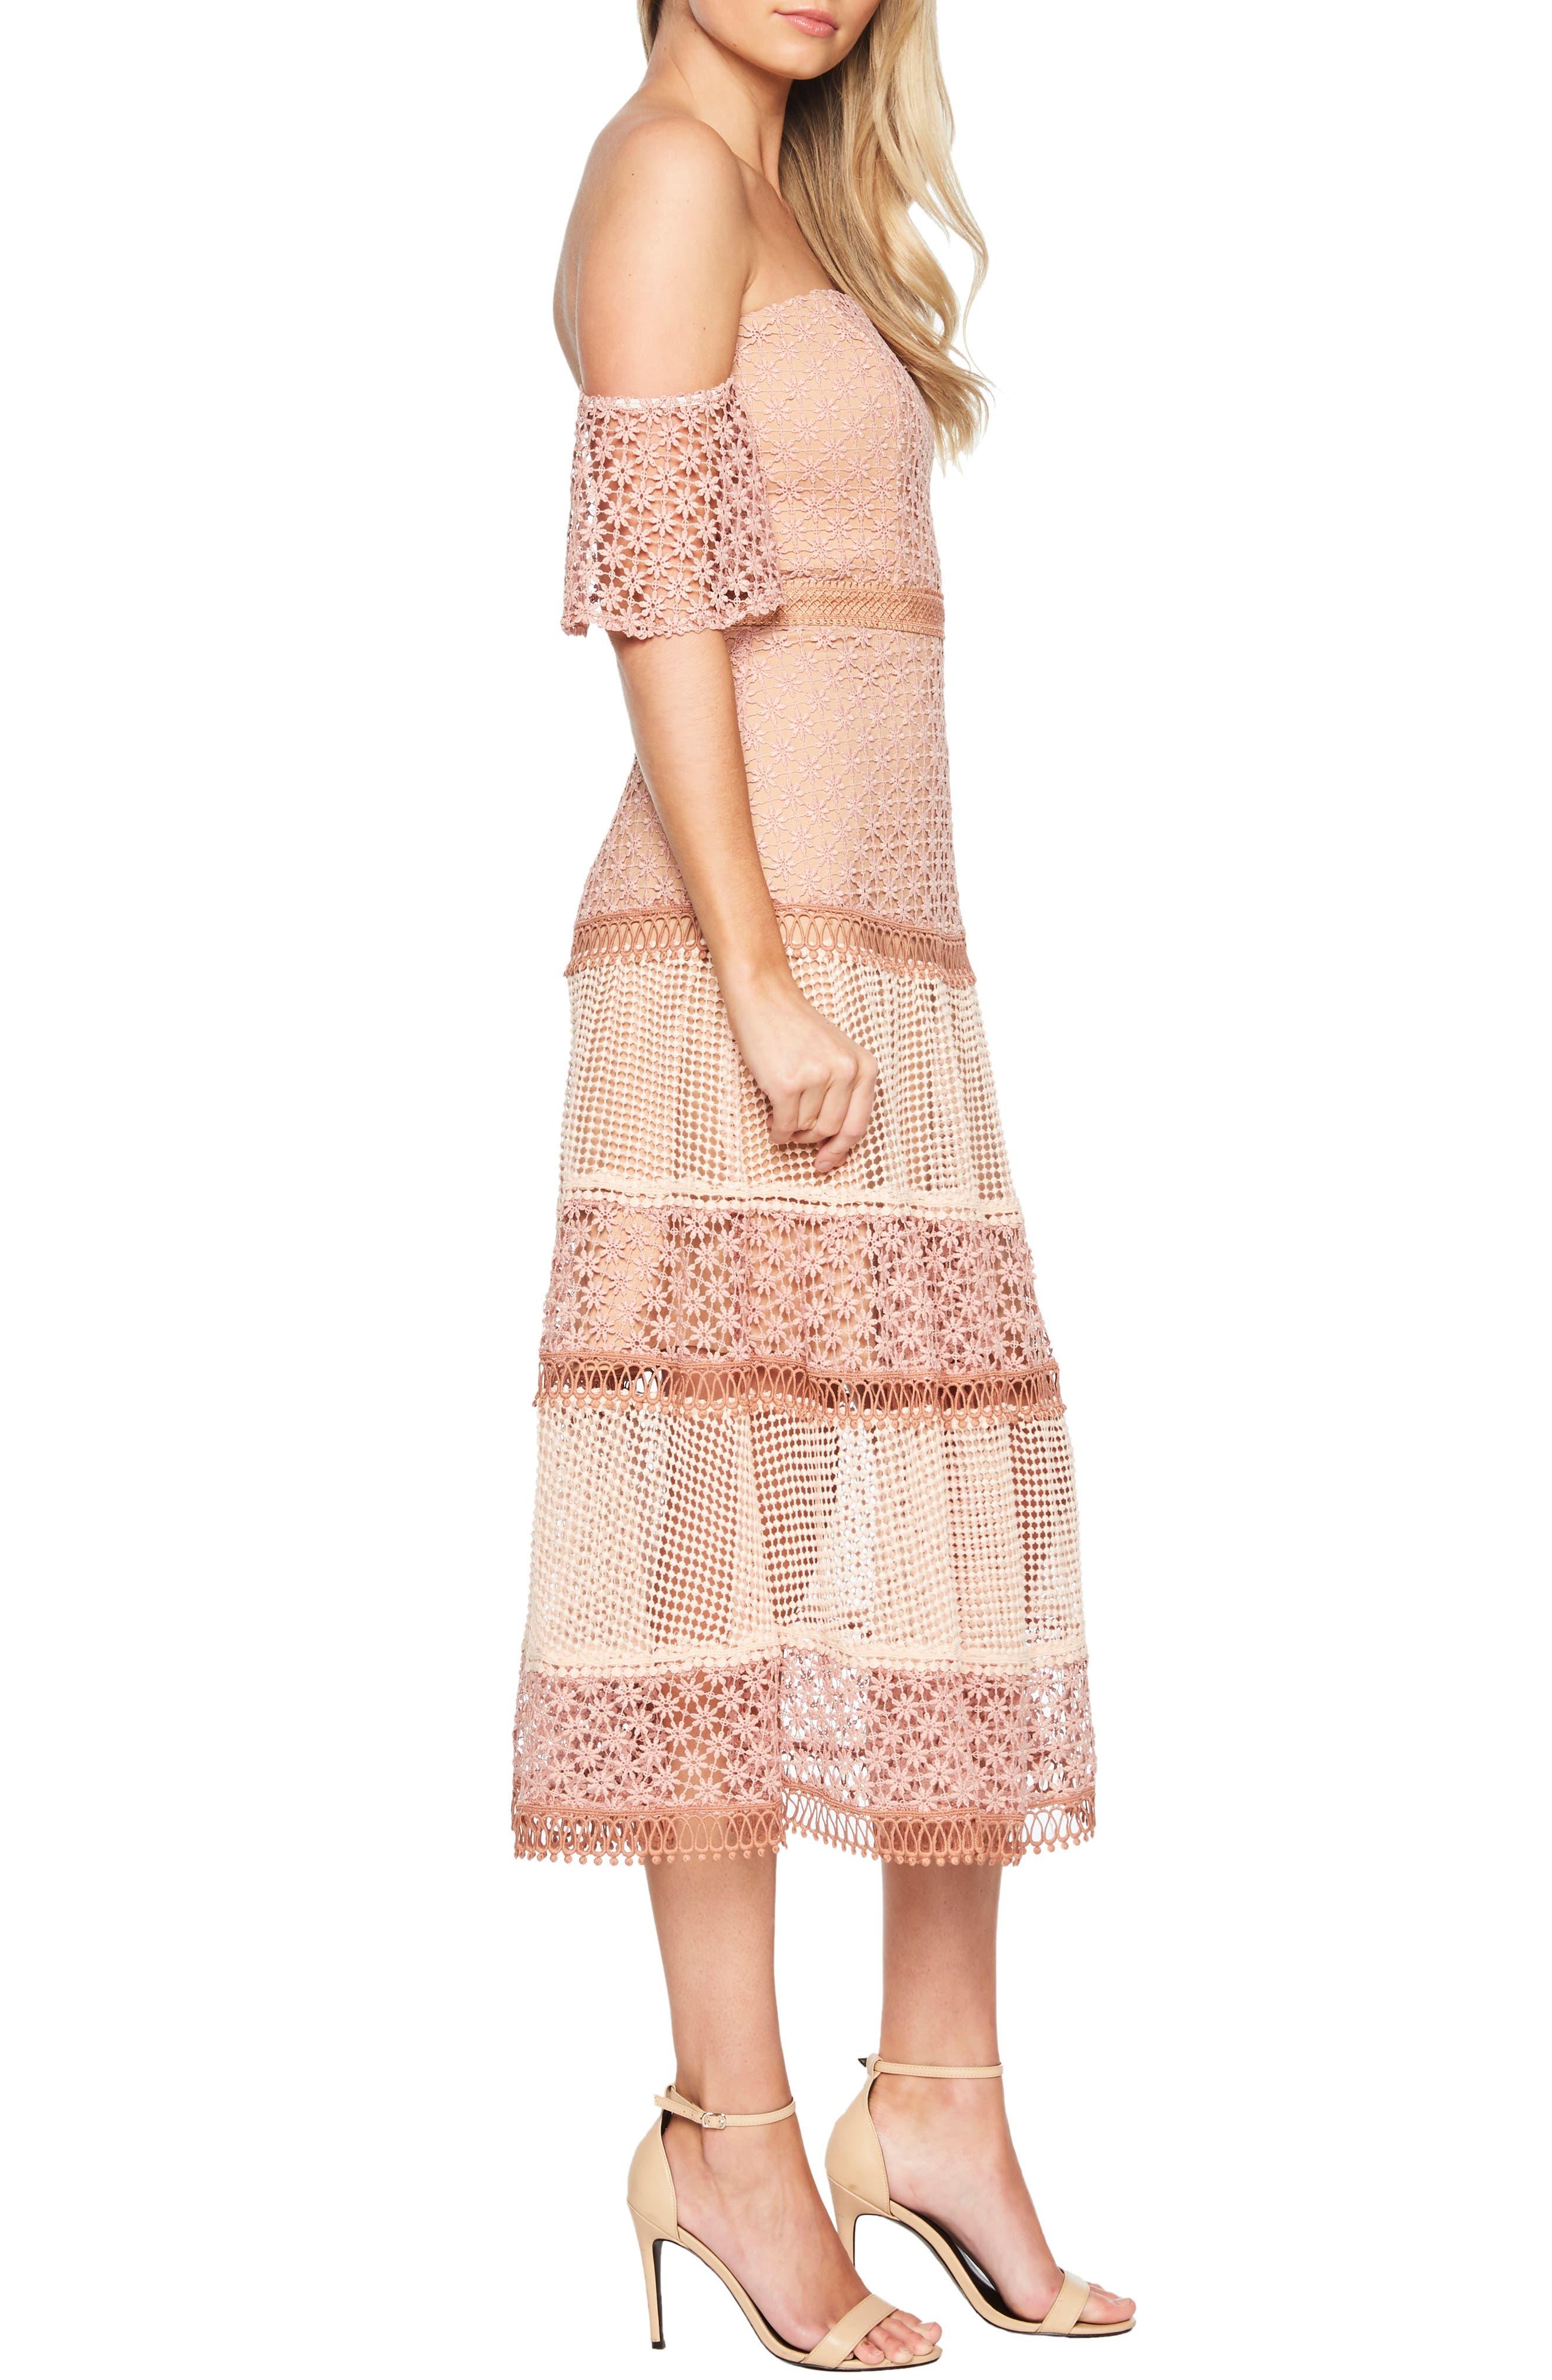 BARDOT, Kristen Off the Shoulder Lace Midi Dress, Alternate thumbnail 4, color, 680